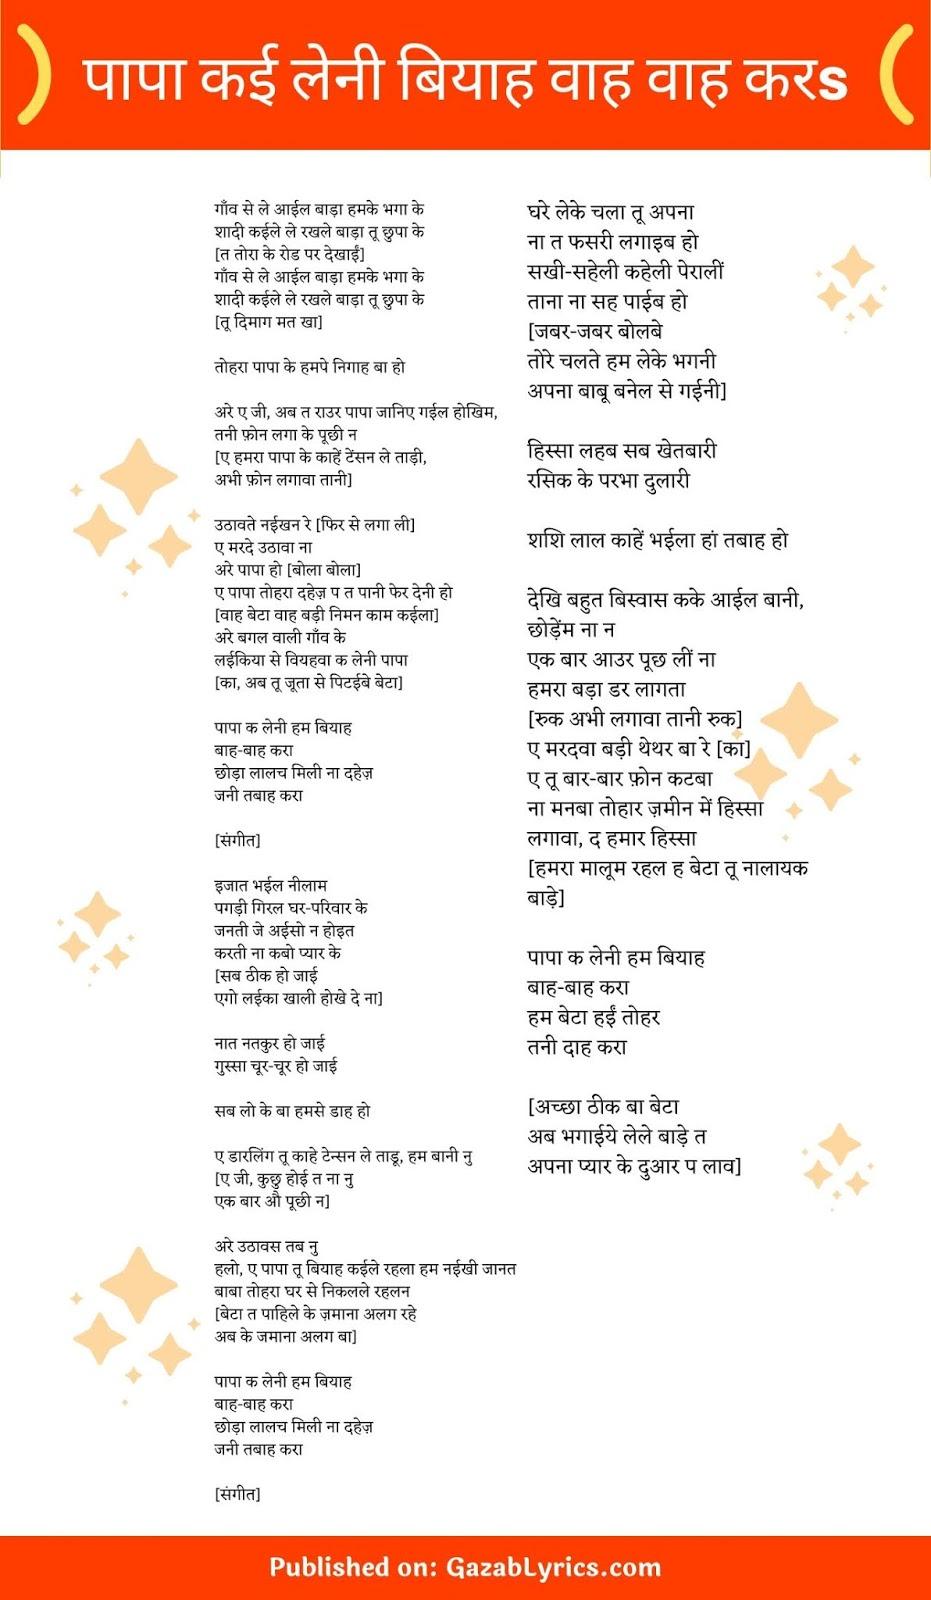 Papa Kai Leni Biyah Bah Bah Kara song lyrics image